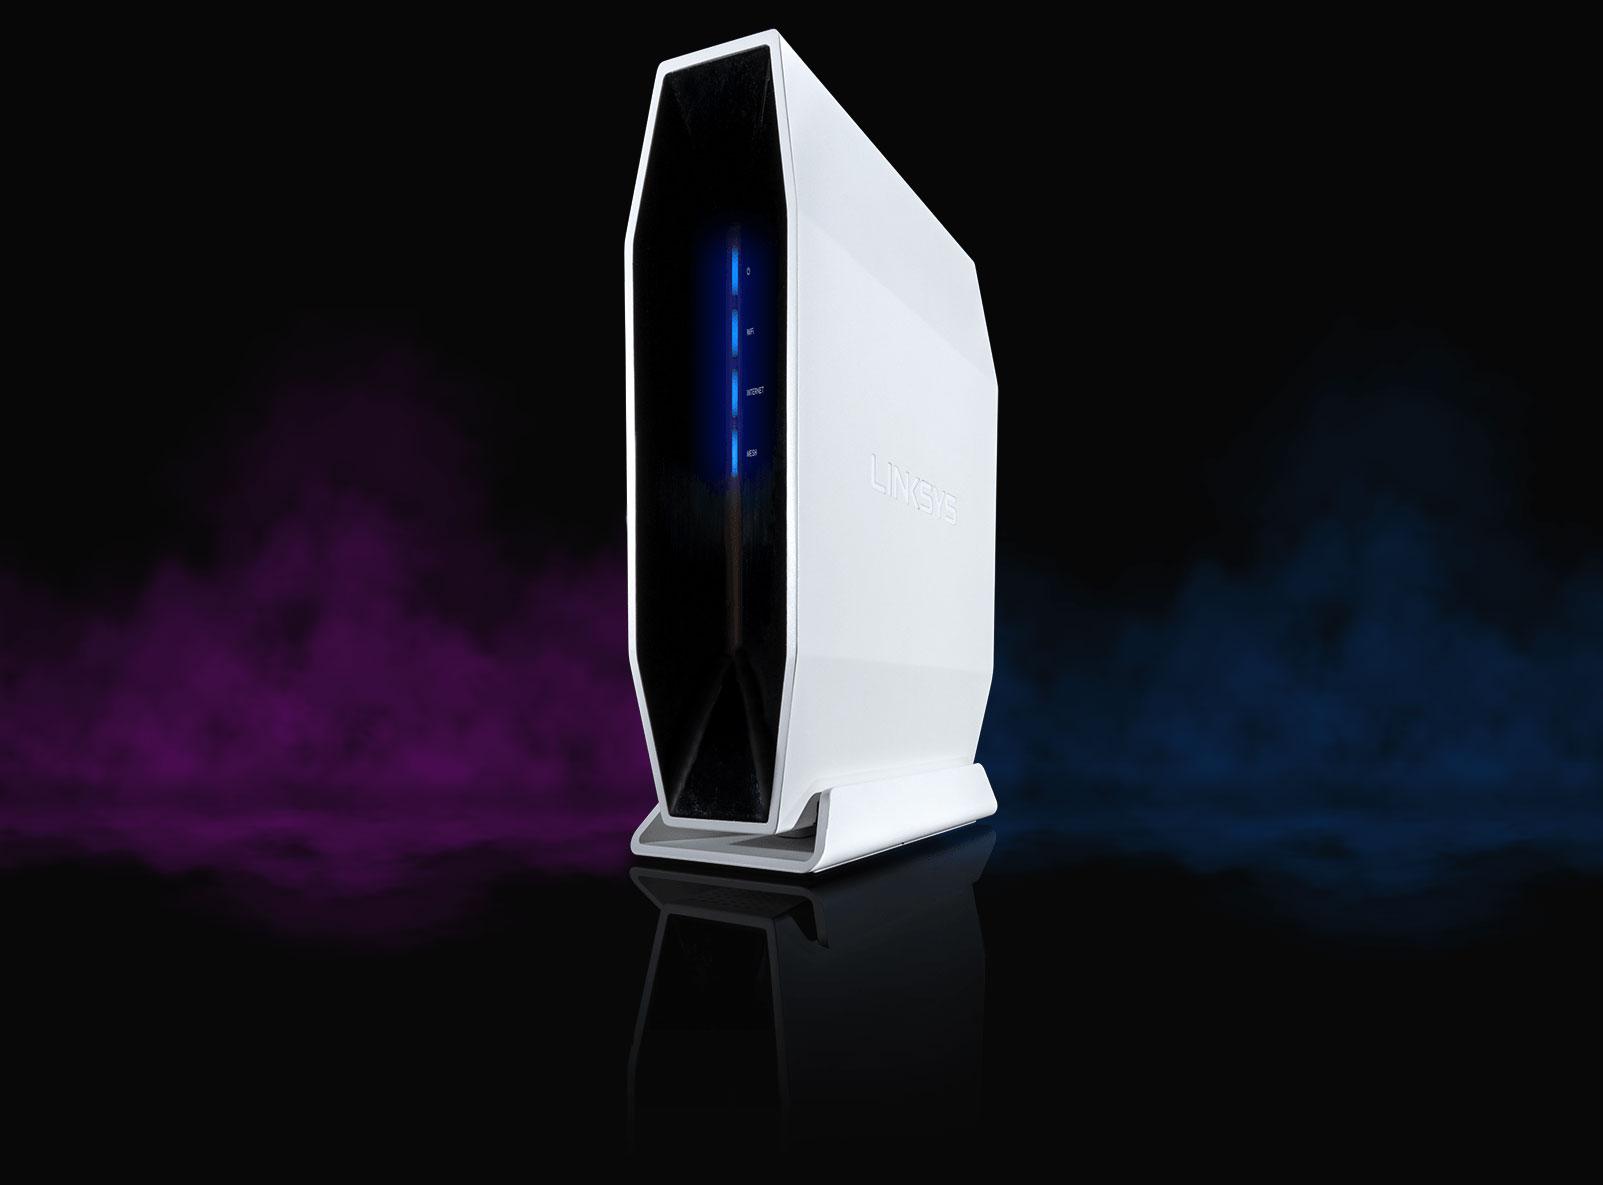 GEARVN.COM - Bộ định tuyến WiFi 6 Linksys MAX-STREAM E9450-AH chuẩn AX5400